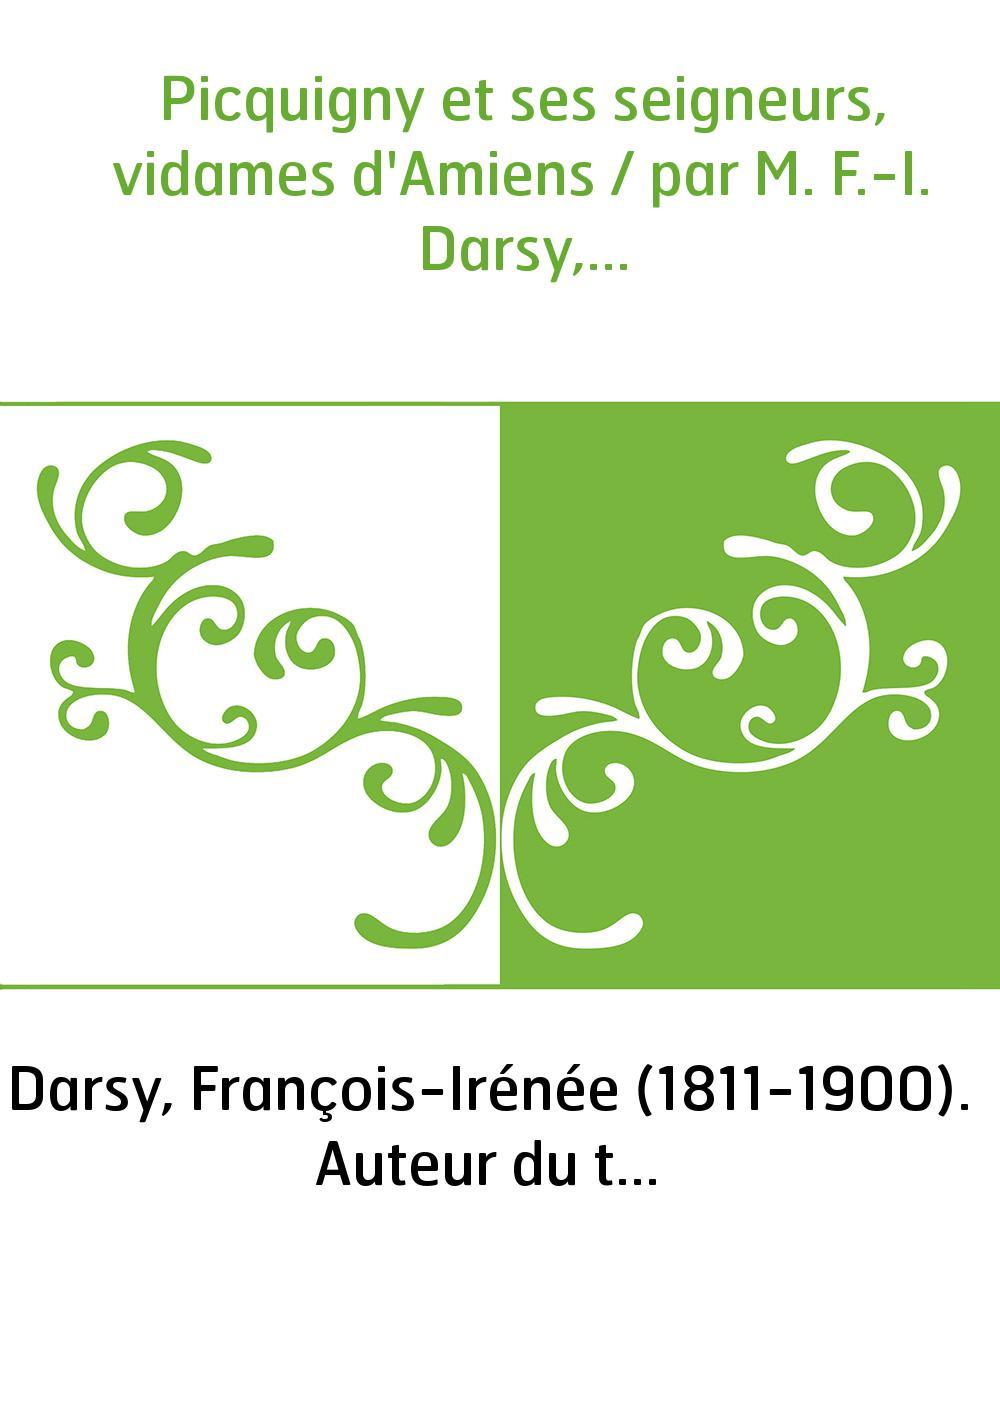 Picquigny et ses seigneurs, vidames d'Amiens / par M. F.-I. Darsy,...